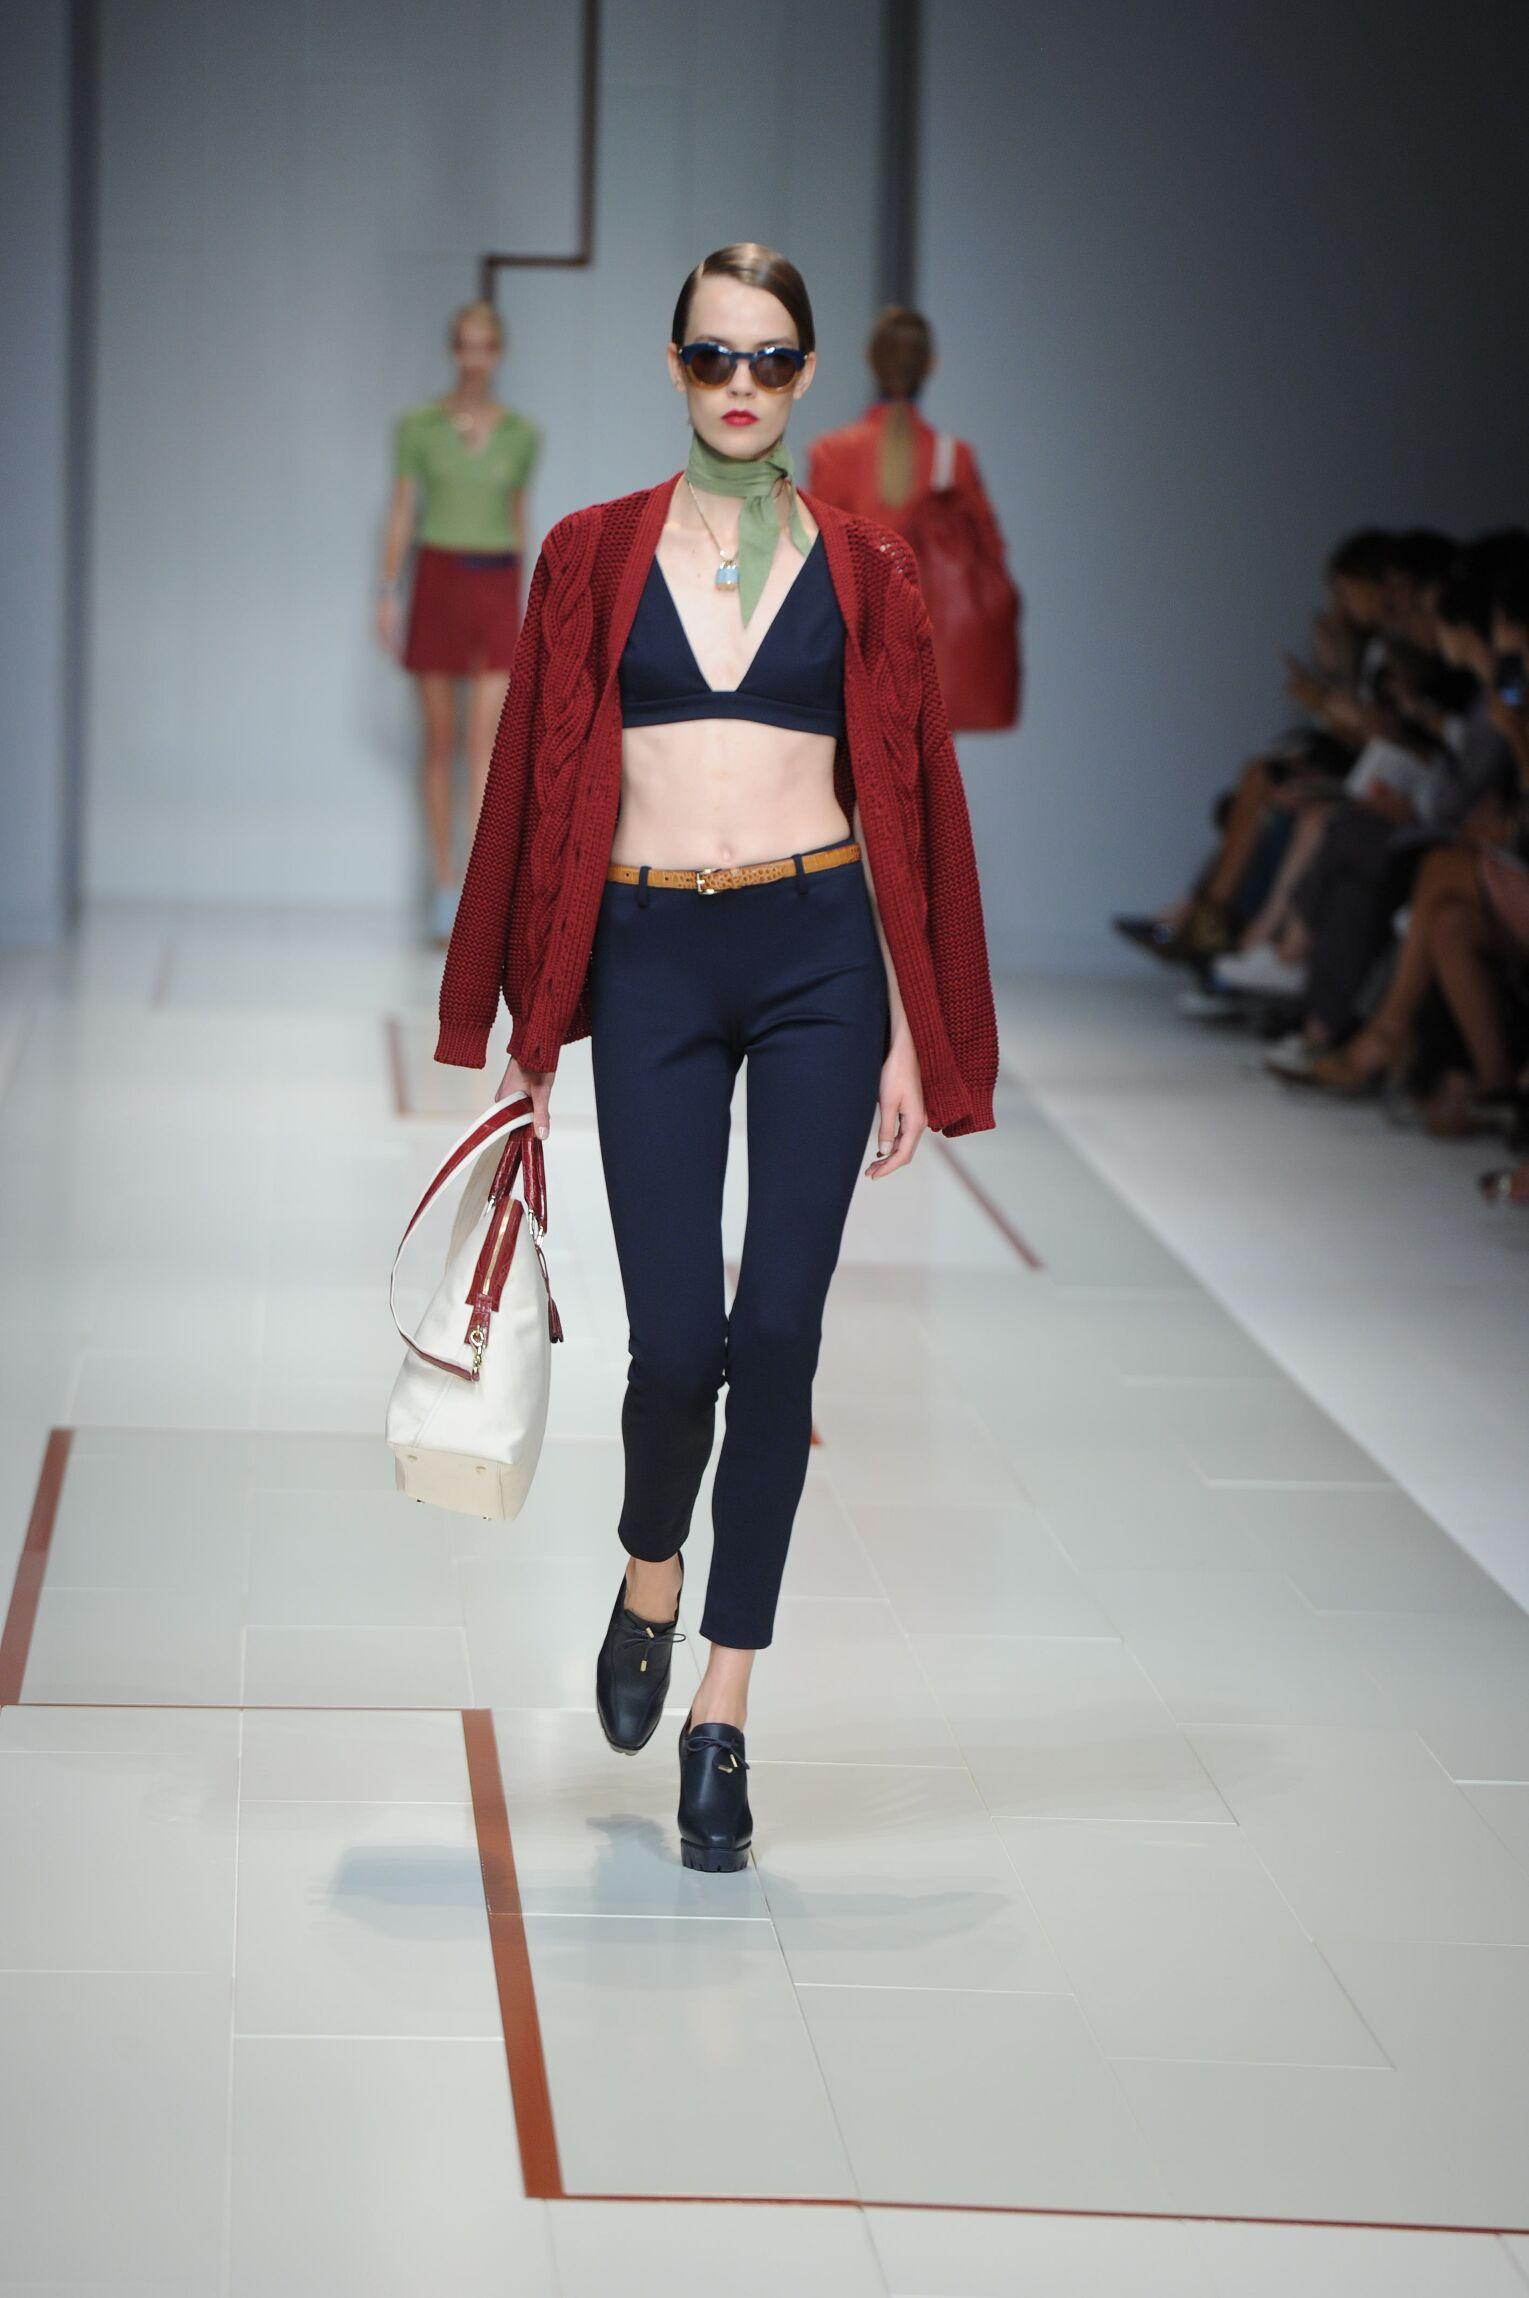 Fashion Woman Model Trussardi Catwalk